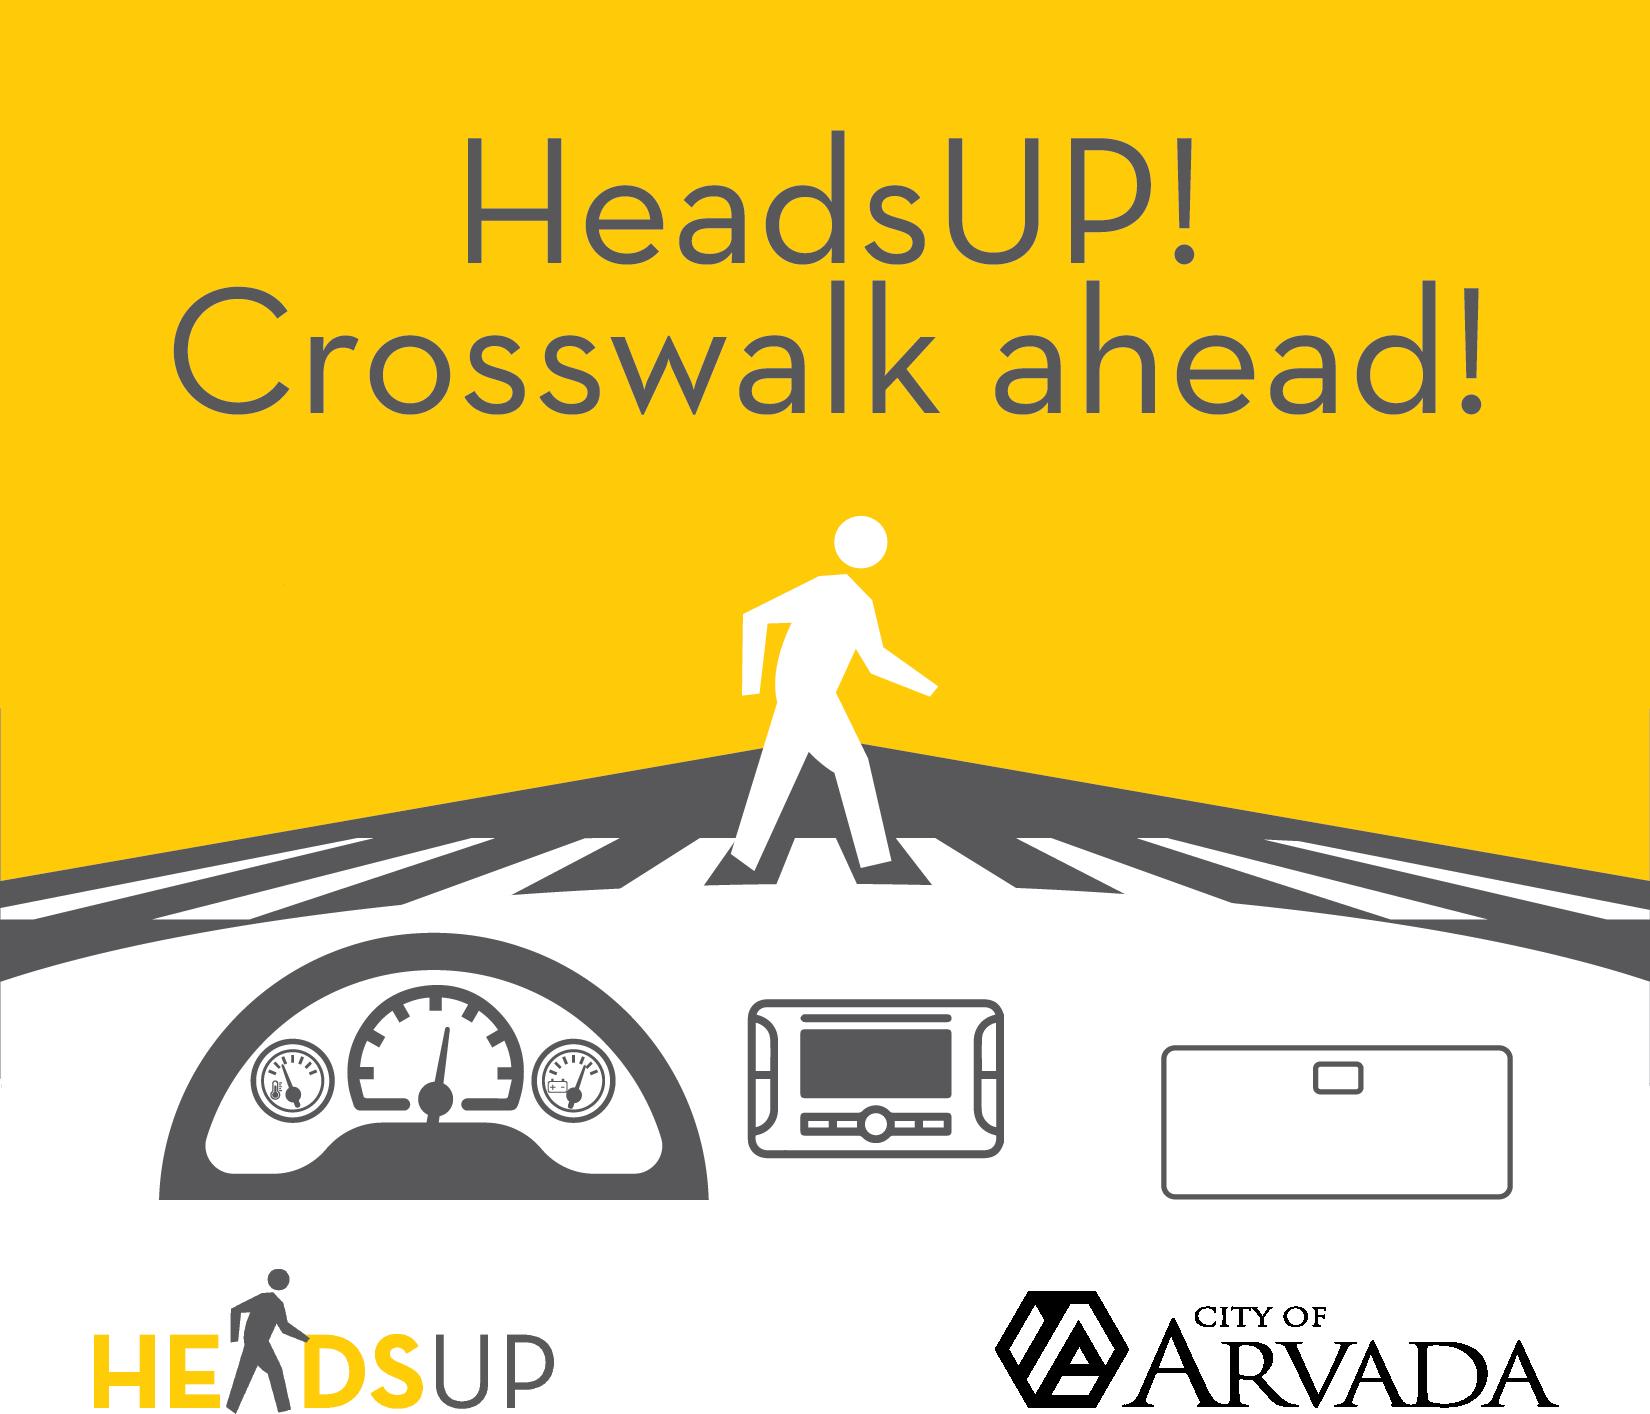 Heads Up crosswalk ahead stick figure crossing the road